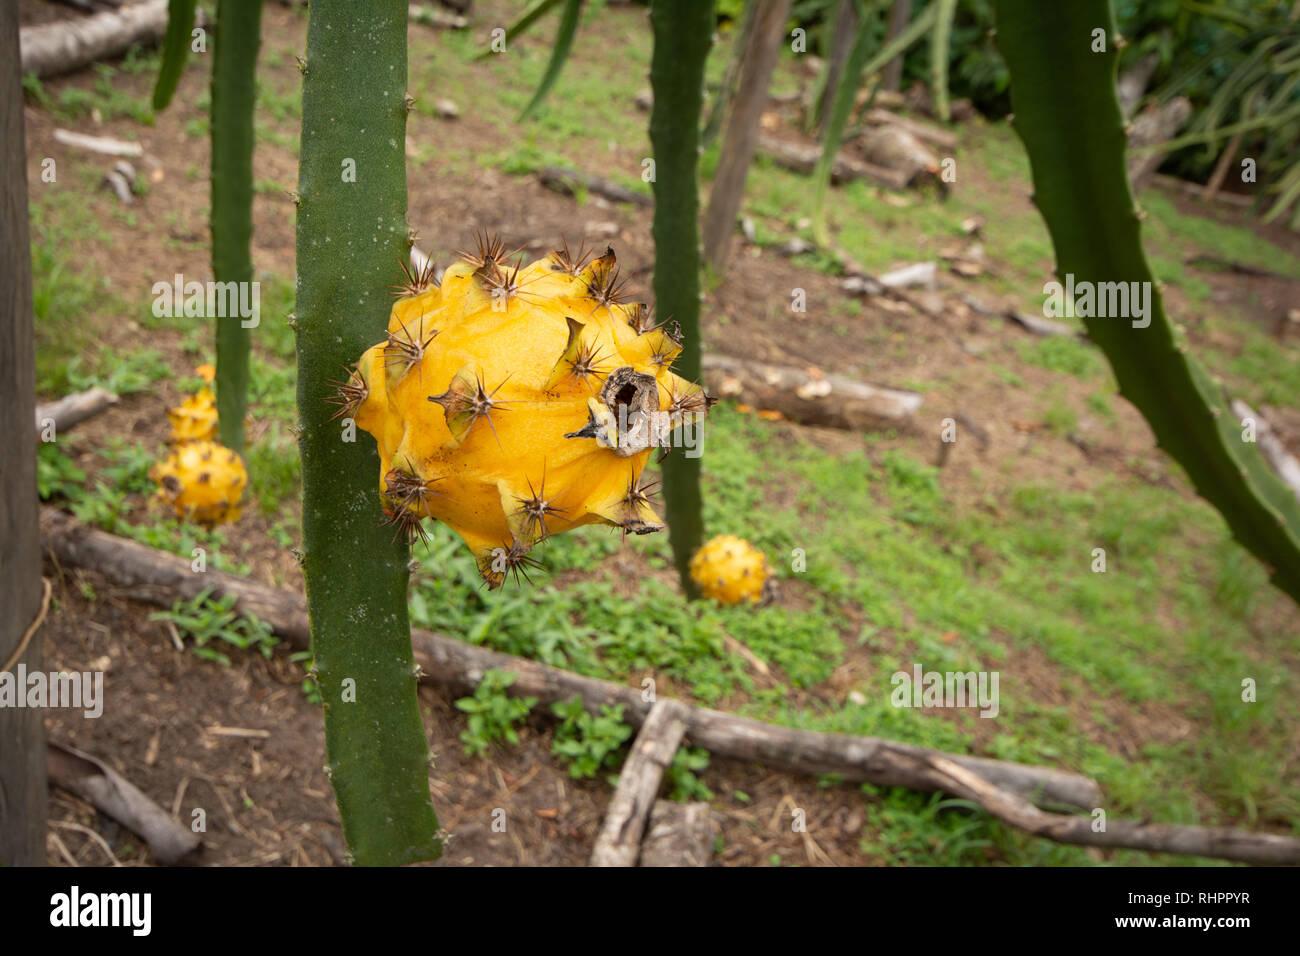 A Yellow Dragon Fruit or Pitaya (Pitahaya) growing on Dragon Fruit Cactus - Stock Image